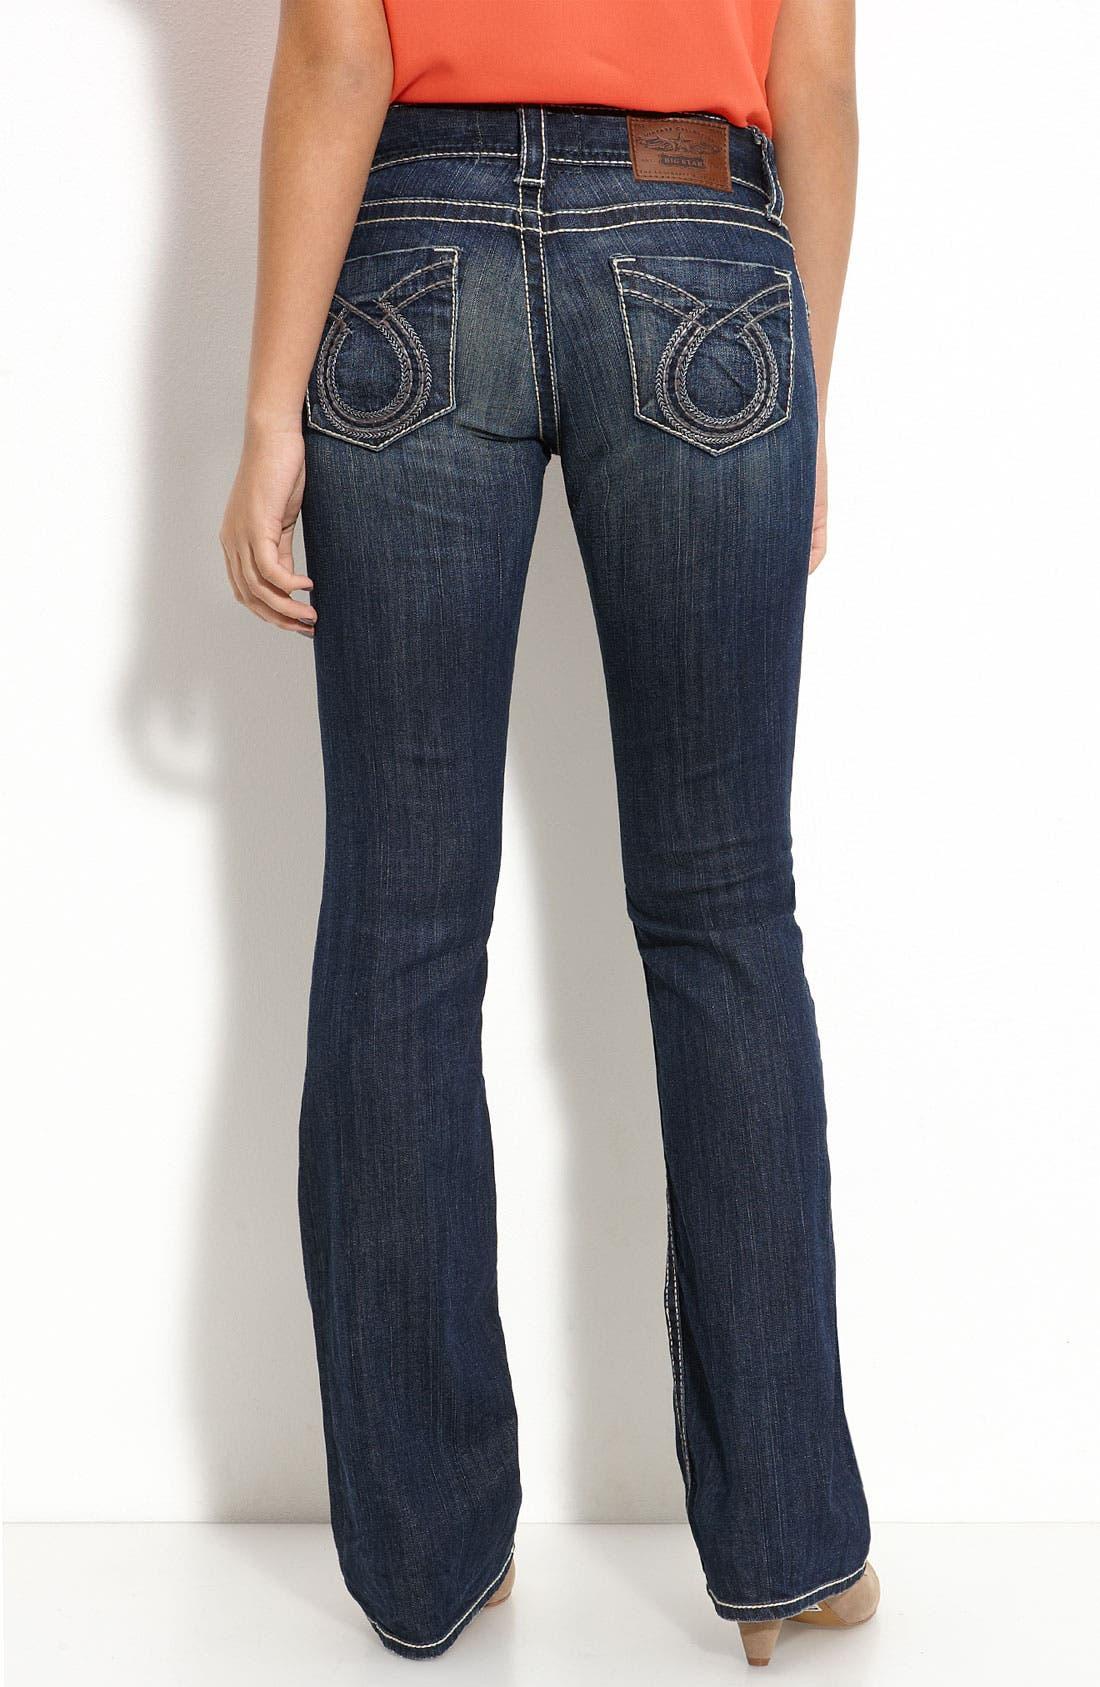 Alternate Image 1 Selected - Big Star 'Sophie' Bootcut Jeans (Juniors)